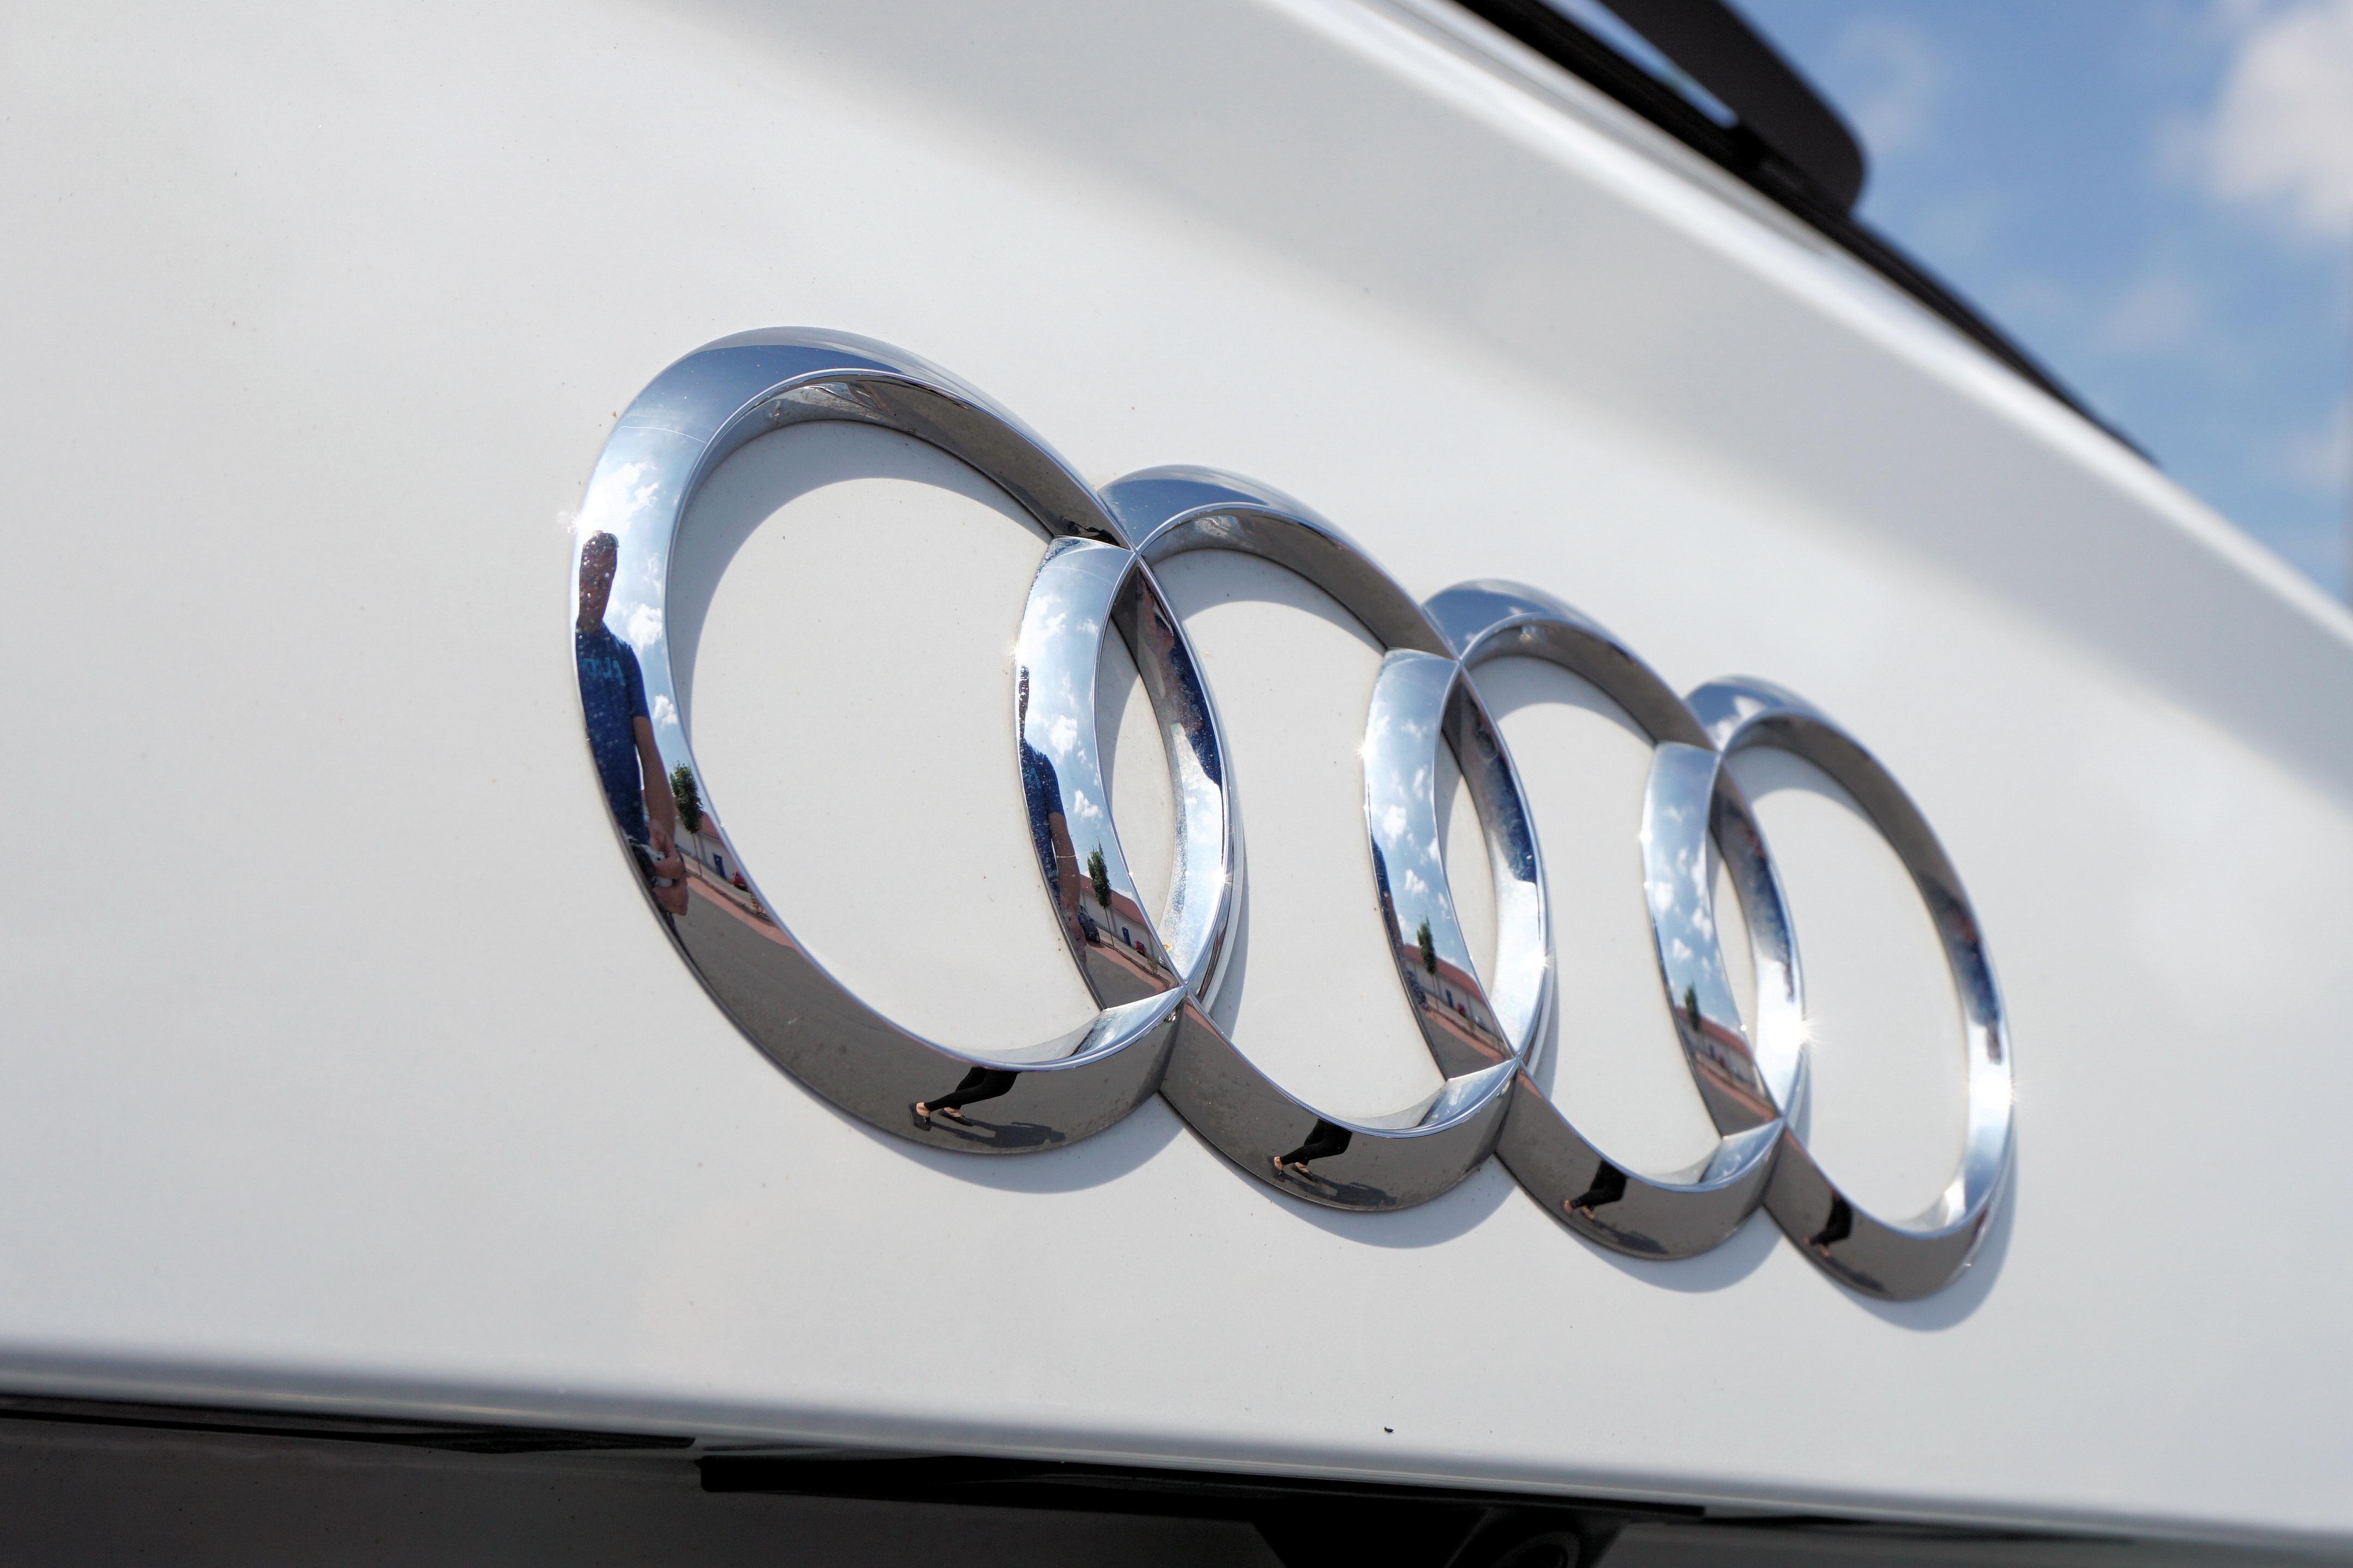 Silver Audi Car Emblem Free Stock Photo - Audi car symbol